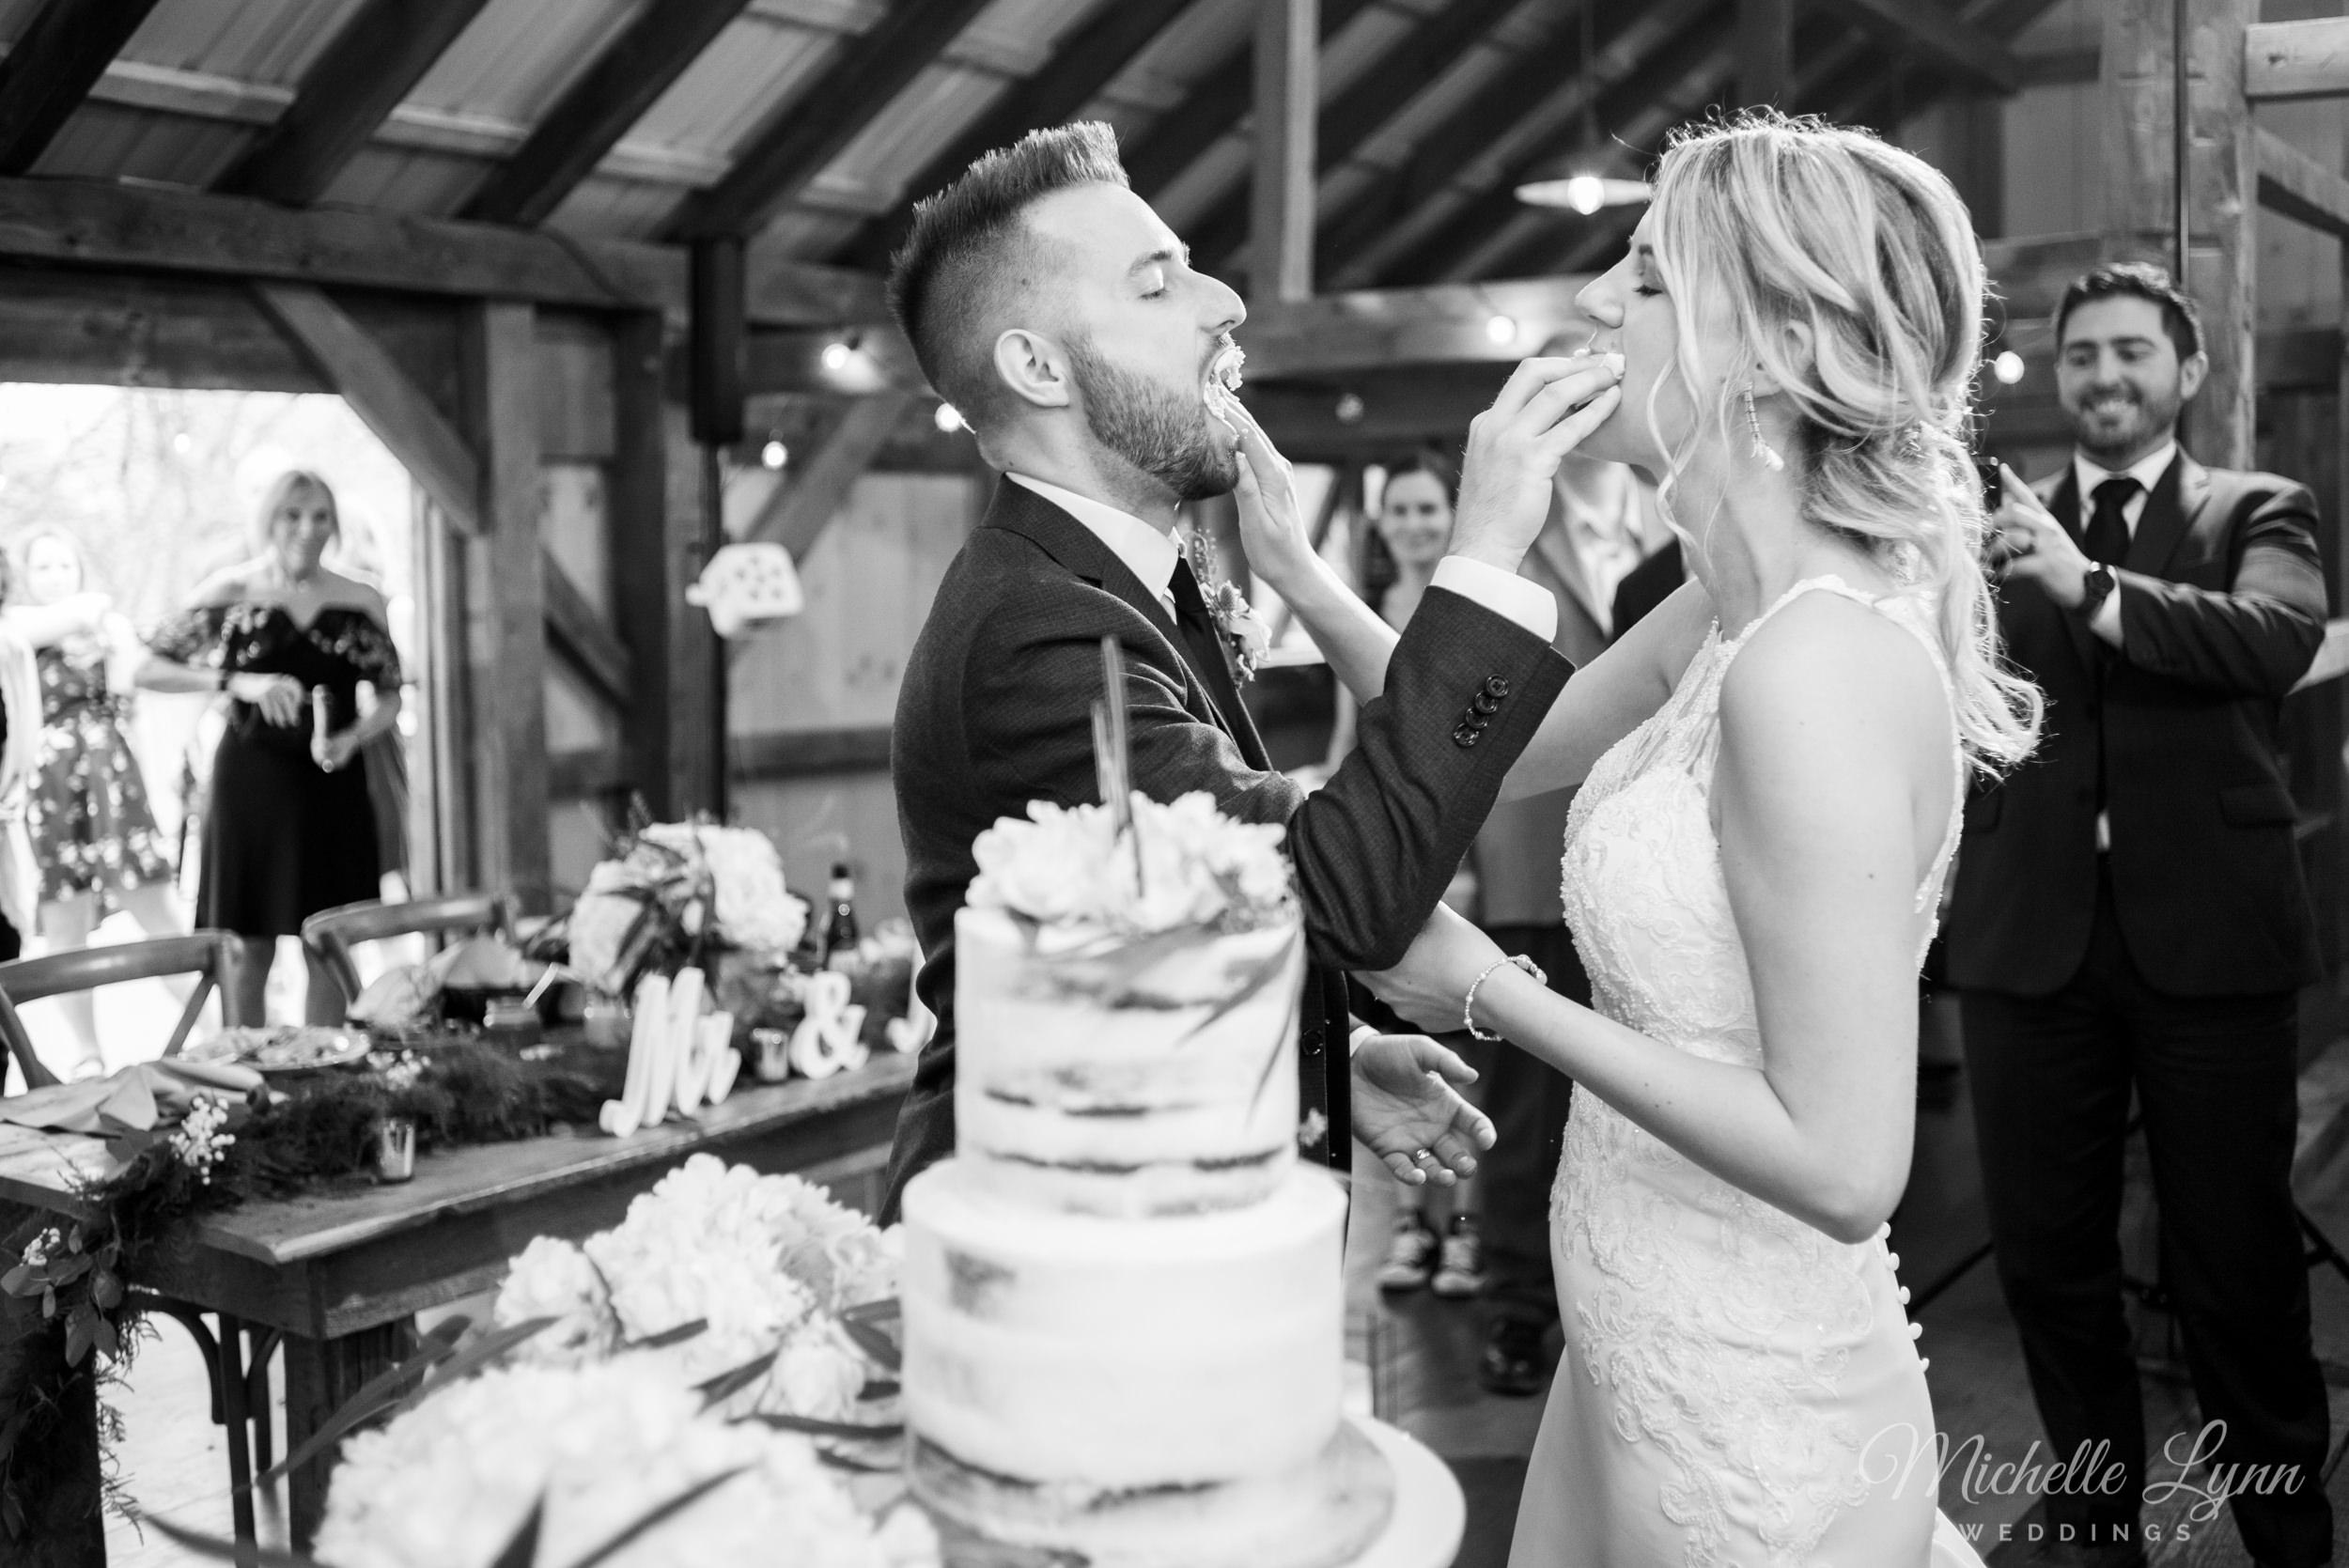 mlw-the-farm-bakery-and-events-wedding-photos-72.jpg